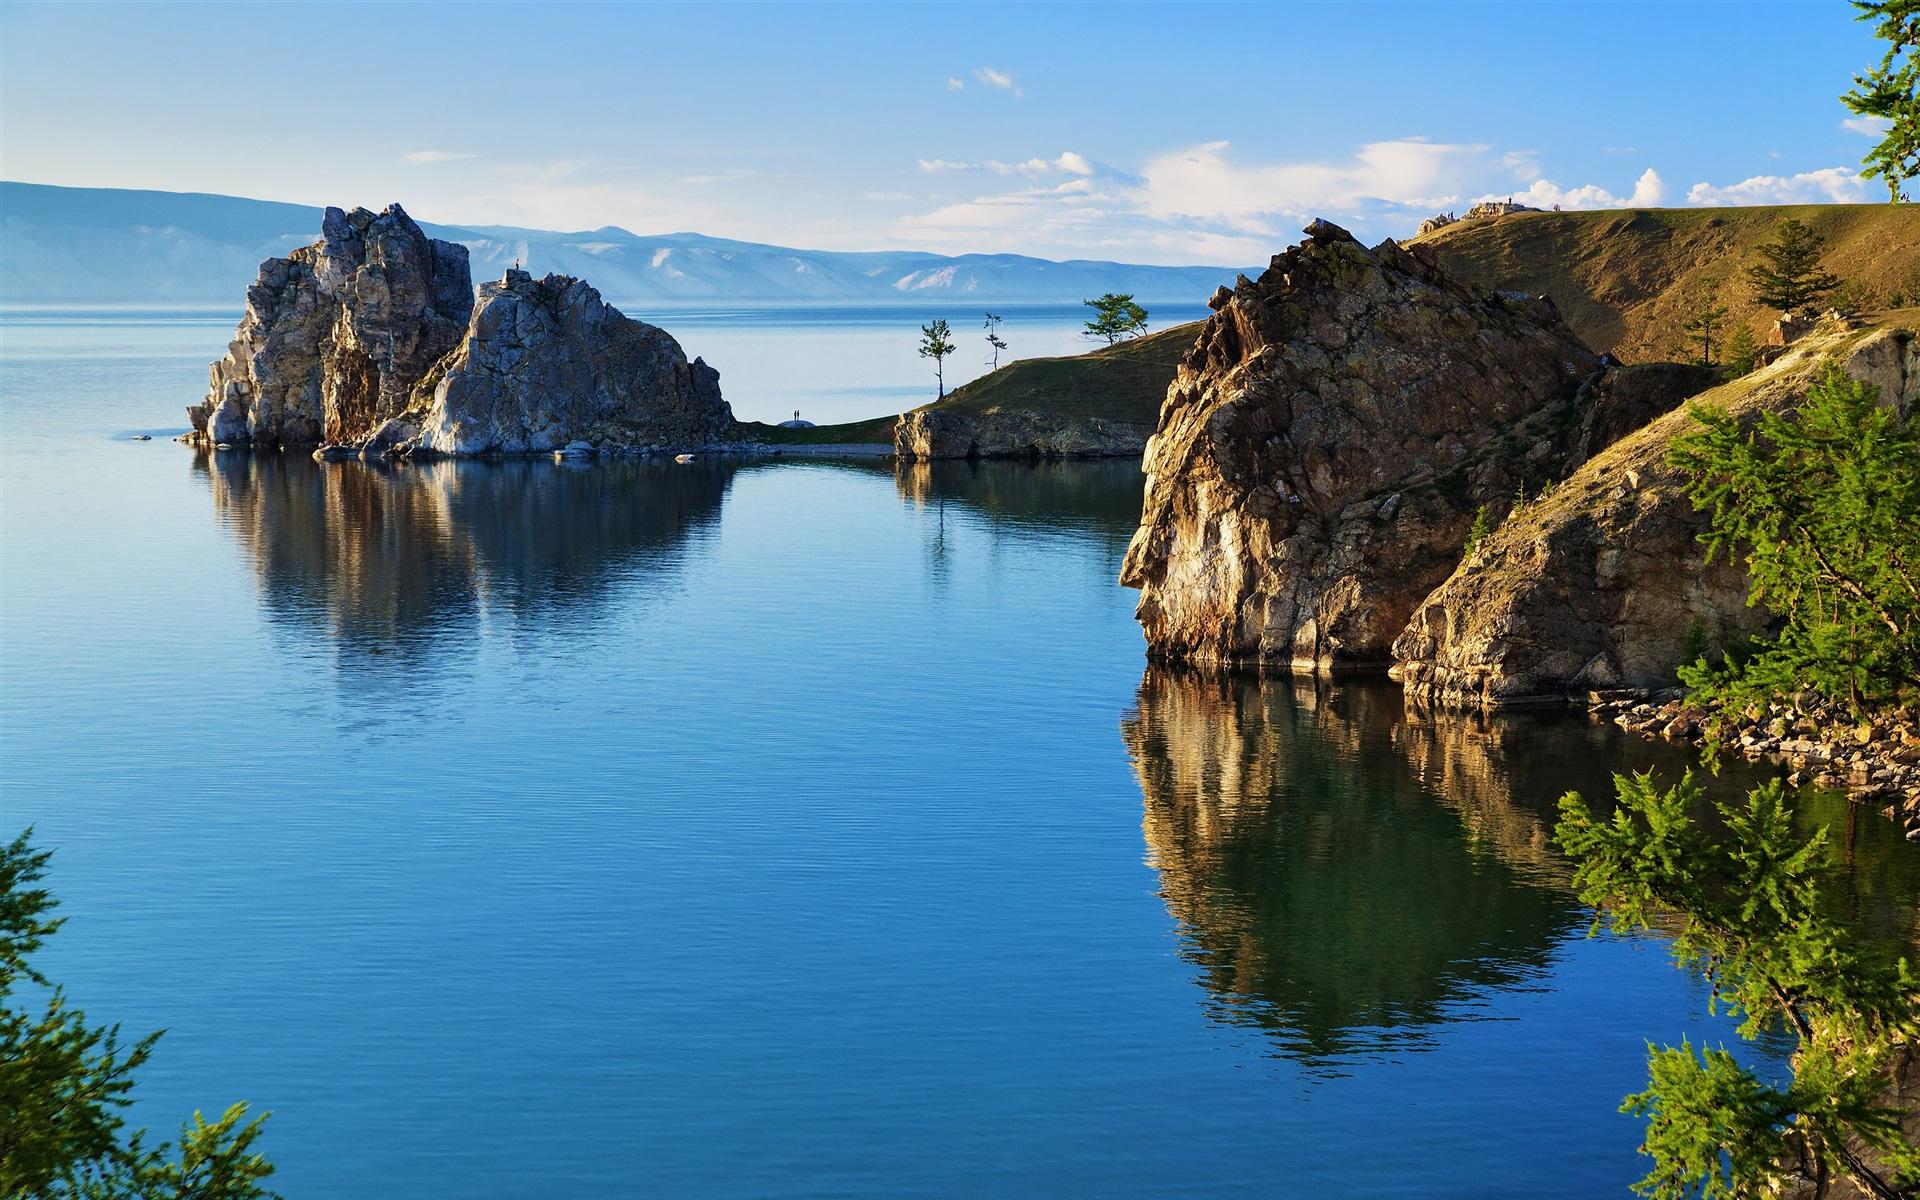 Fonds d 39 cran russie nature paysage ba kal lac rochers 3840x2160 uhd 4k image - 4k wallpaper russia ...